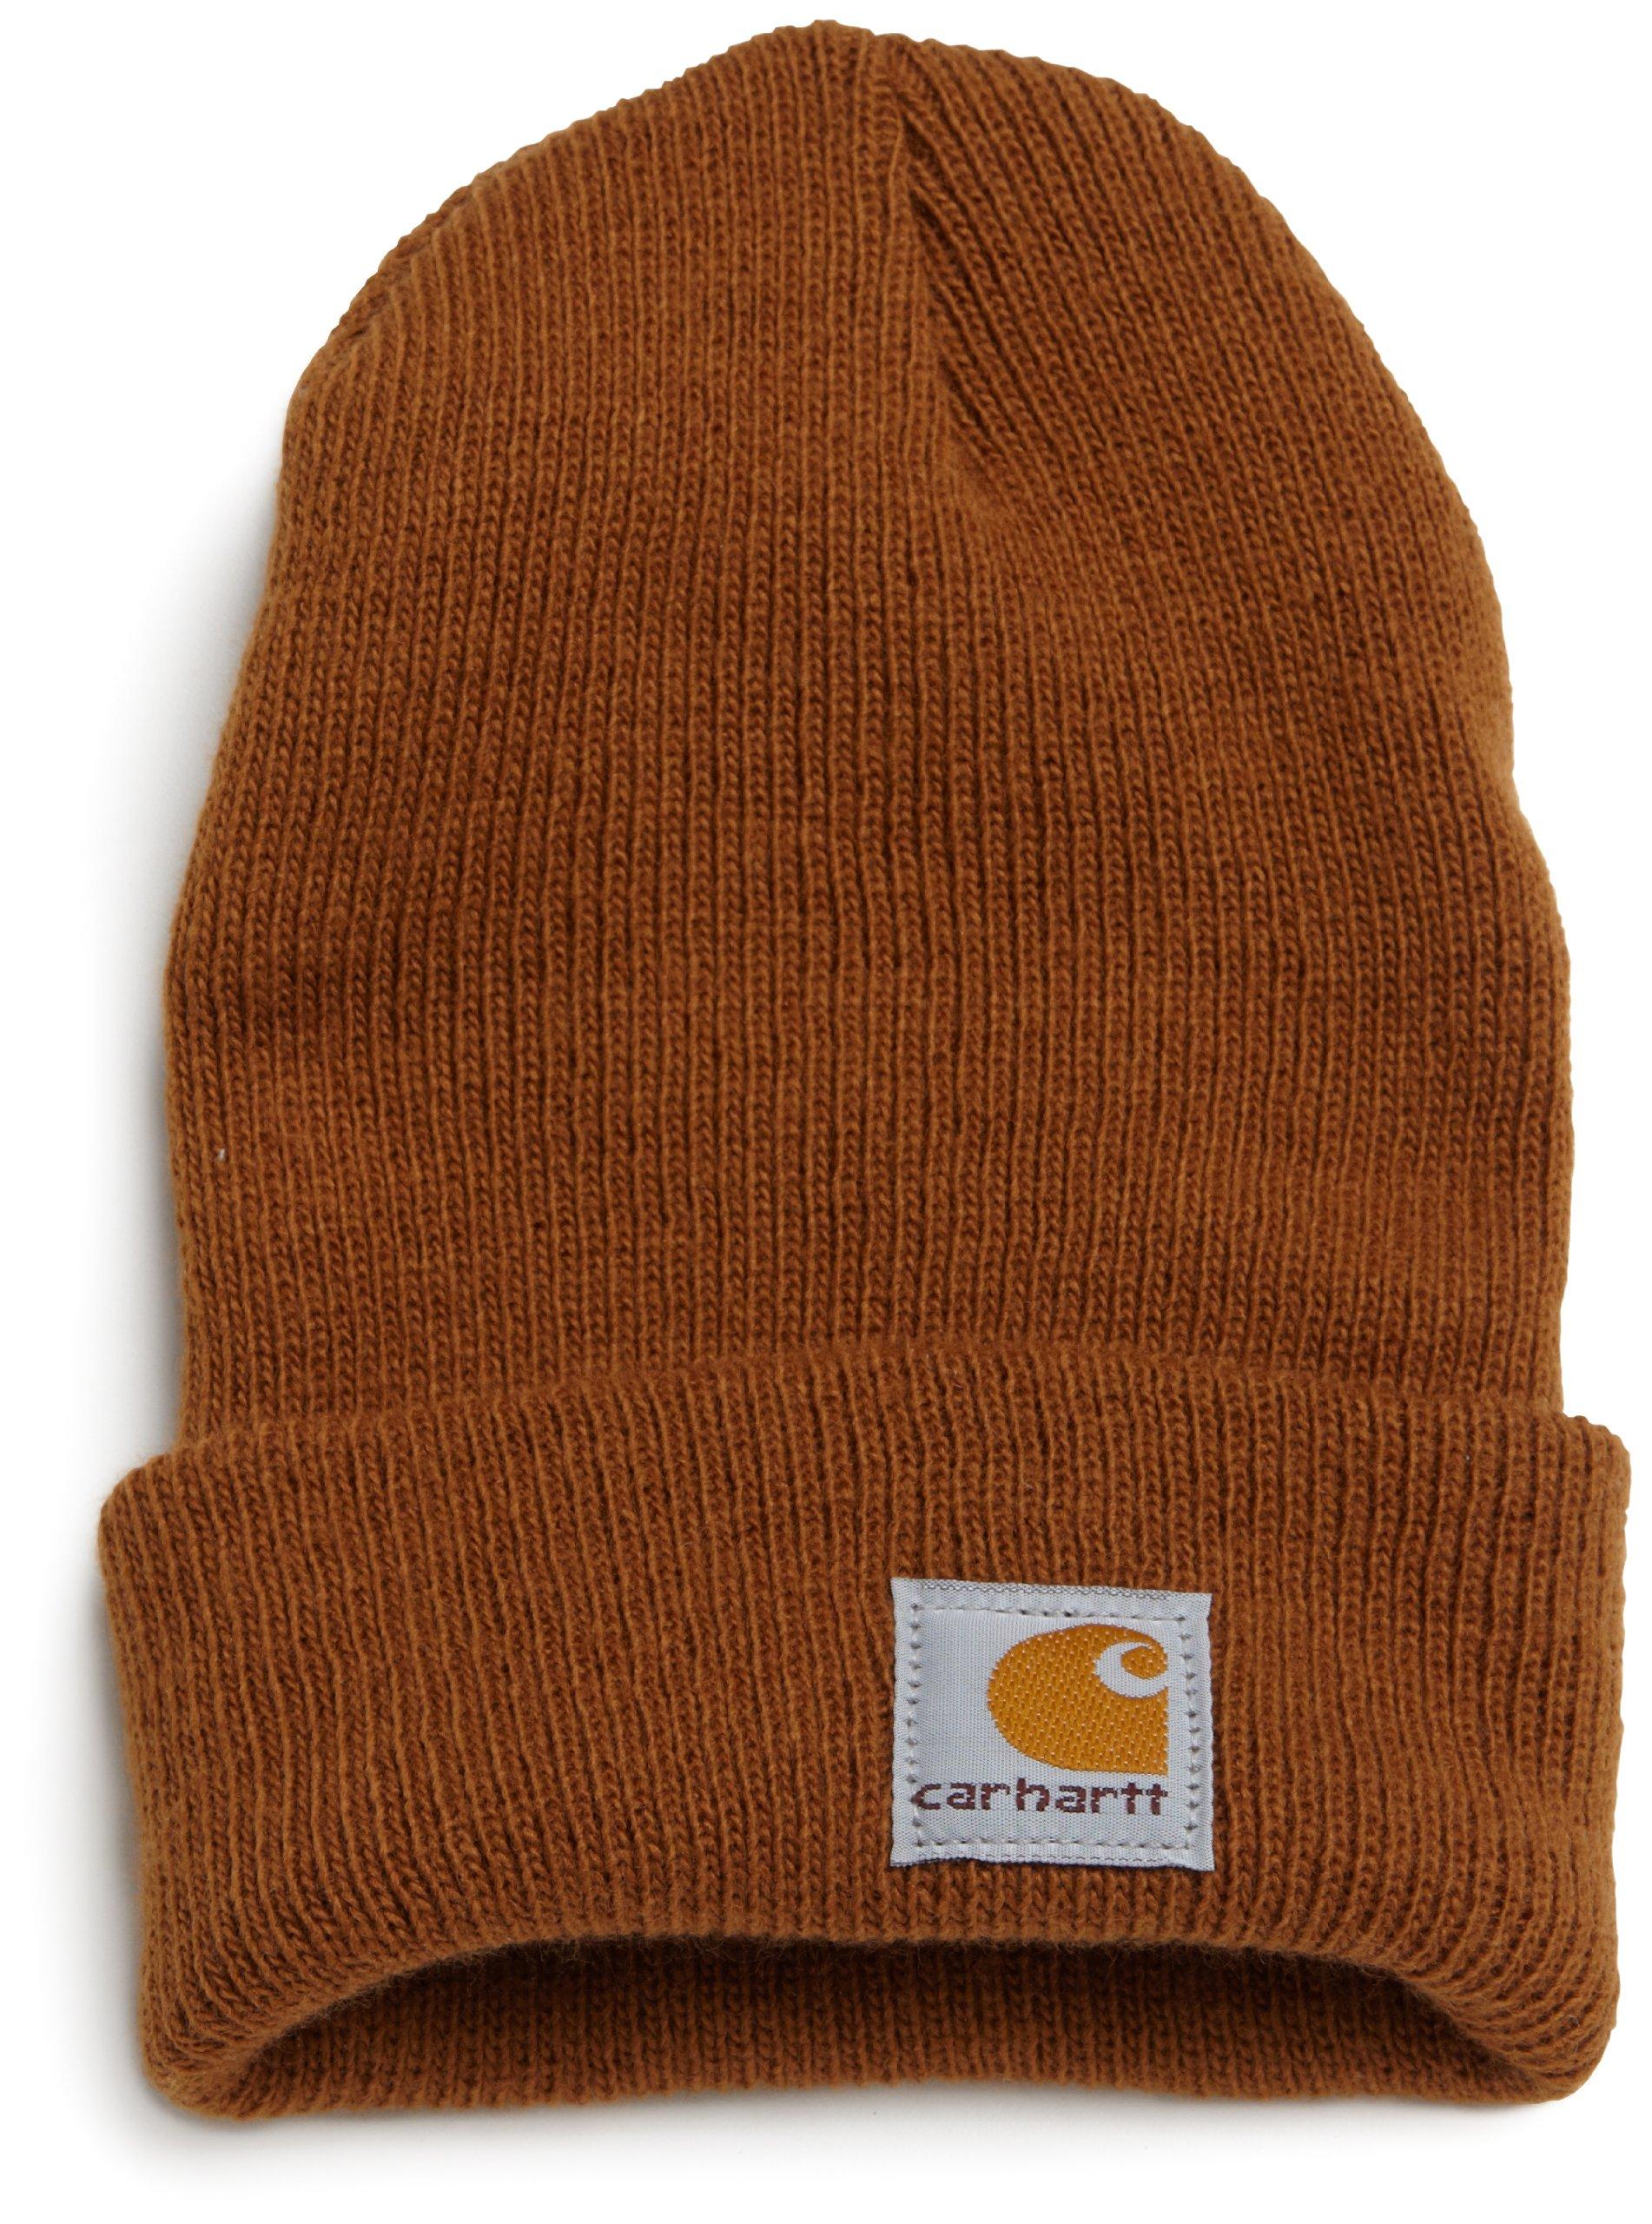 Carhartt Kids Acrylic Watch Hat